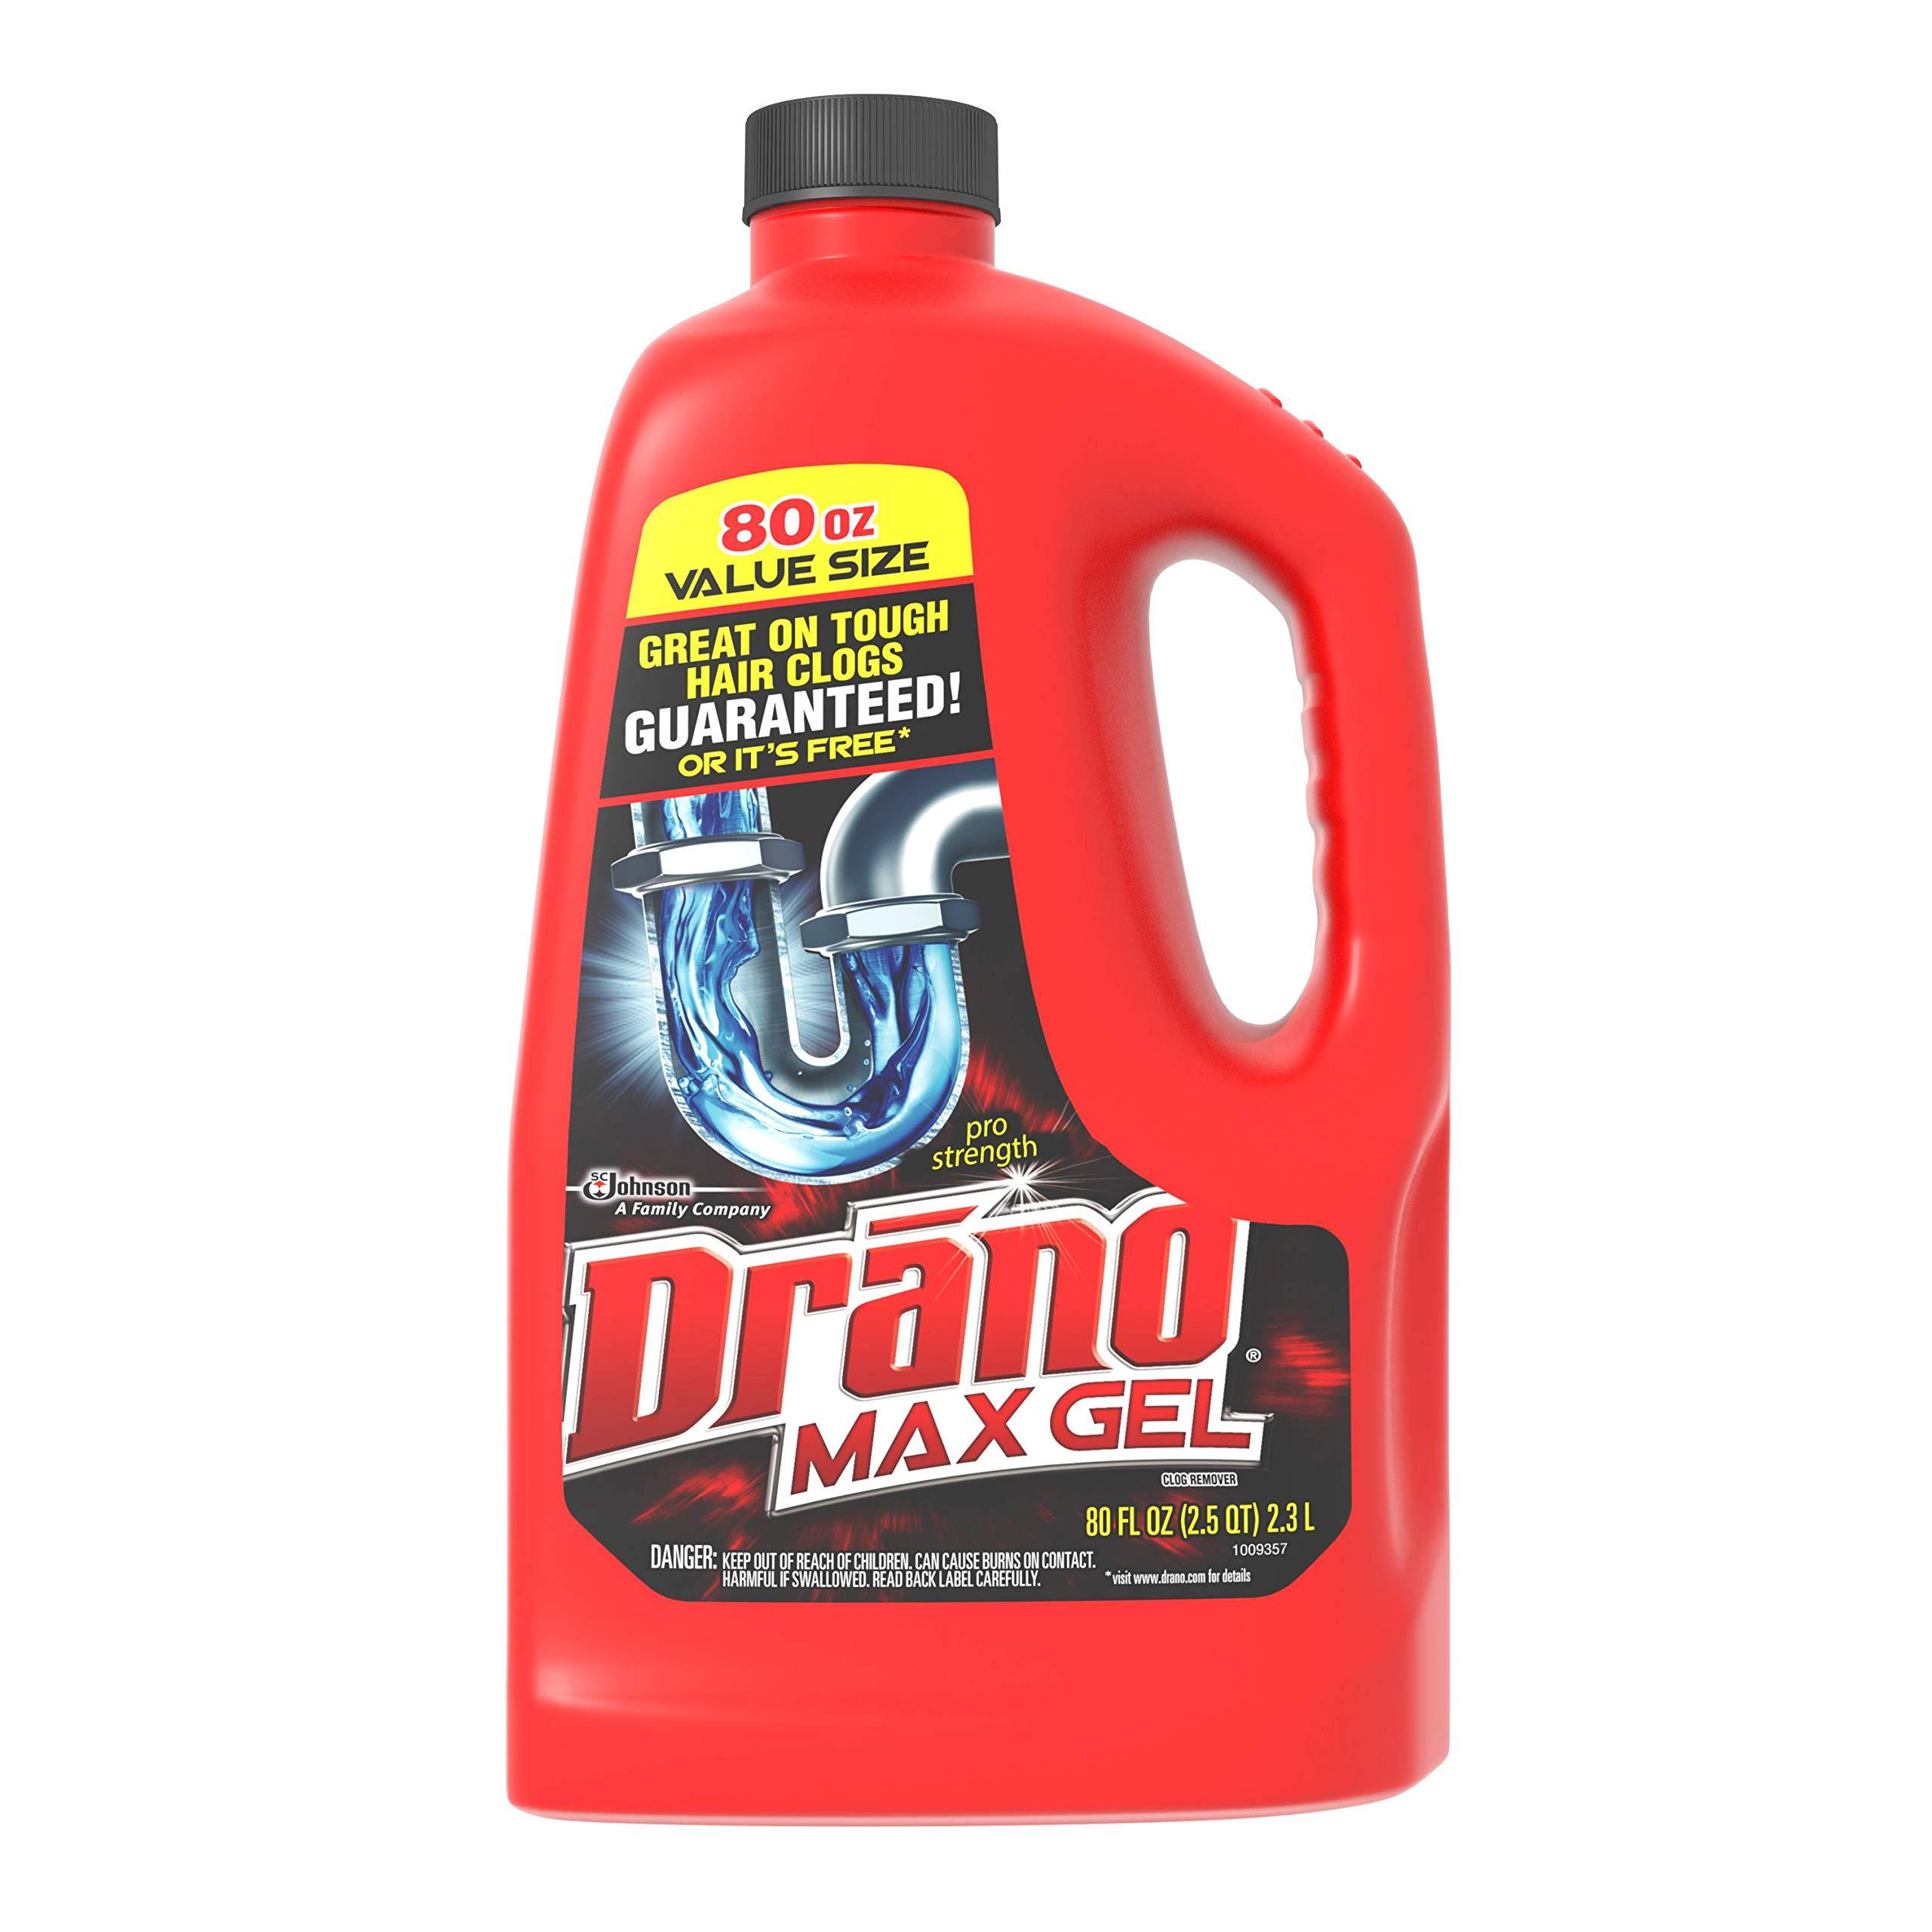 Drano Max Gel Clog Remover, 80 OZ by Drano (Image #1)